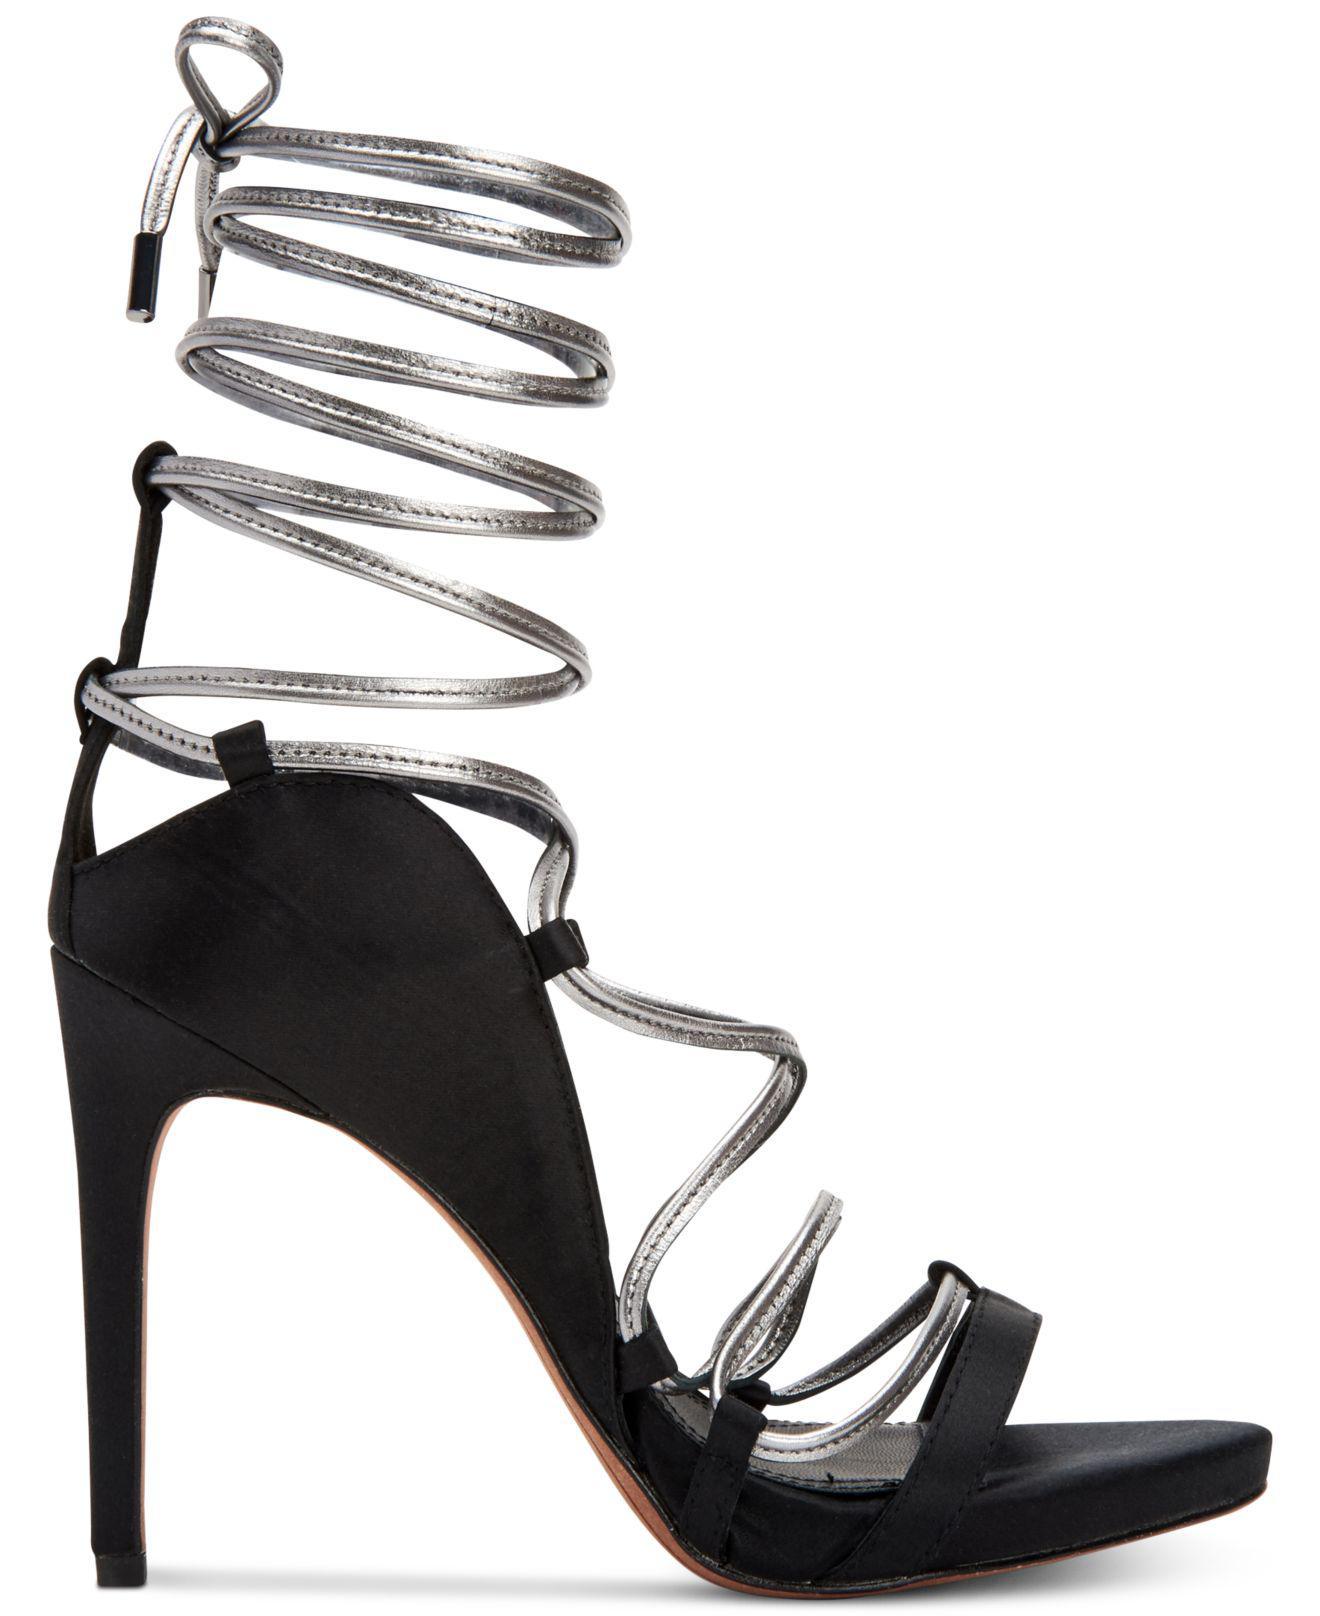 17bd320a85521c Lyst - BCBGMAXAZRIA Esme Strappy Dress Sandals in Black